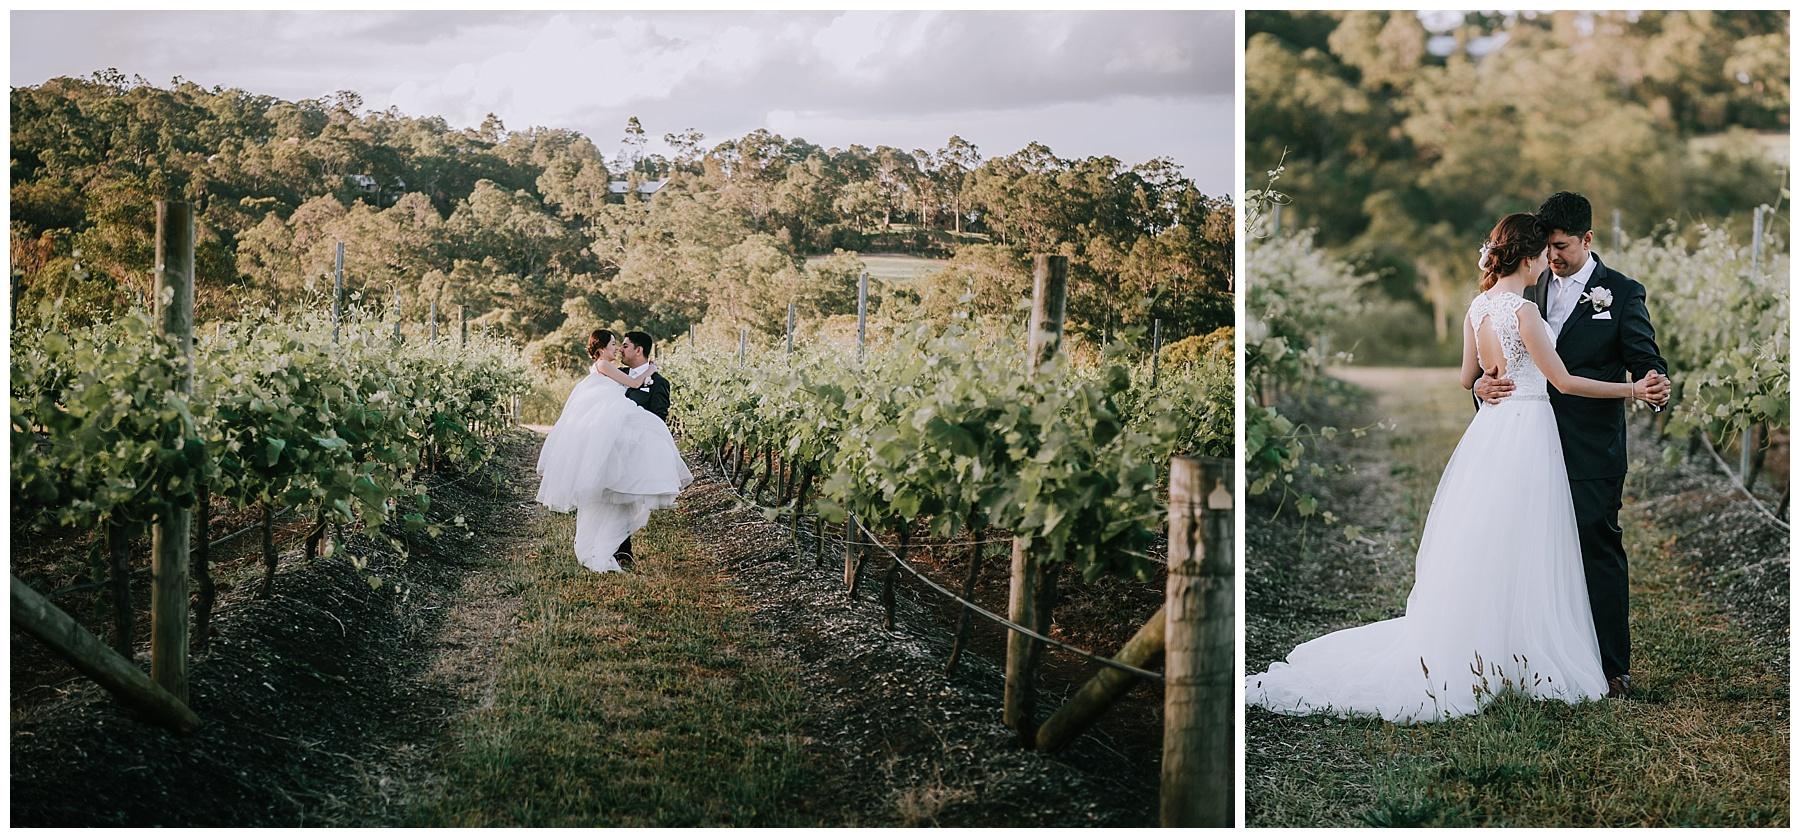 AUDREY WILKING COCKFIGHTERS GHOST Wedding Photographer_0062.jpg